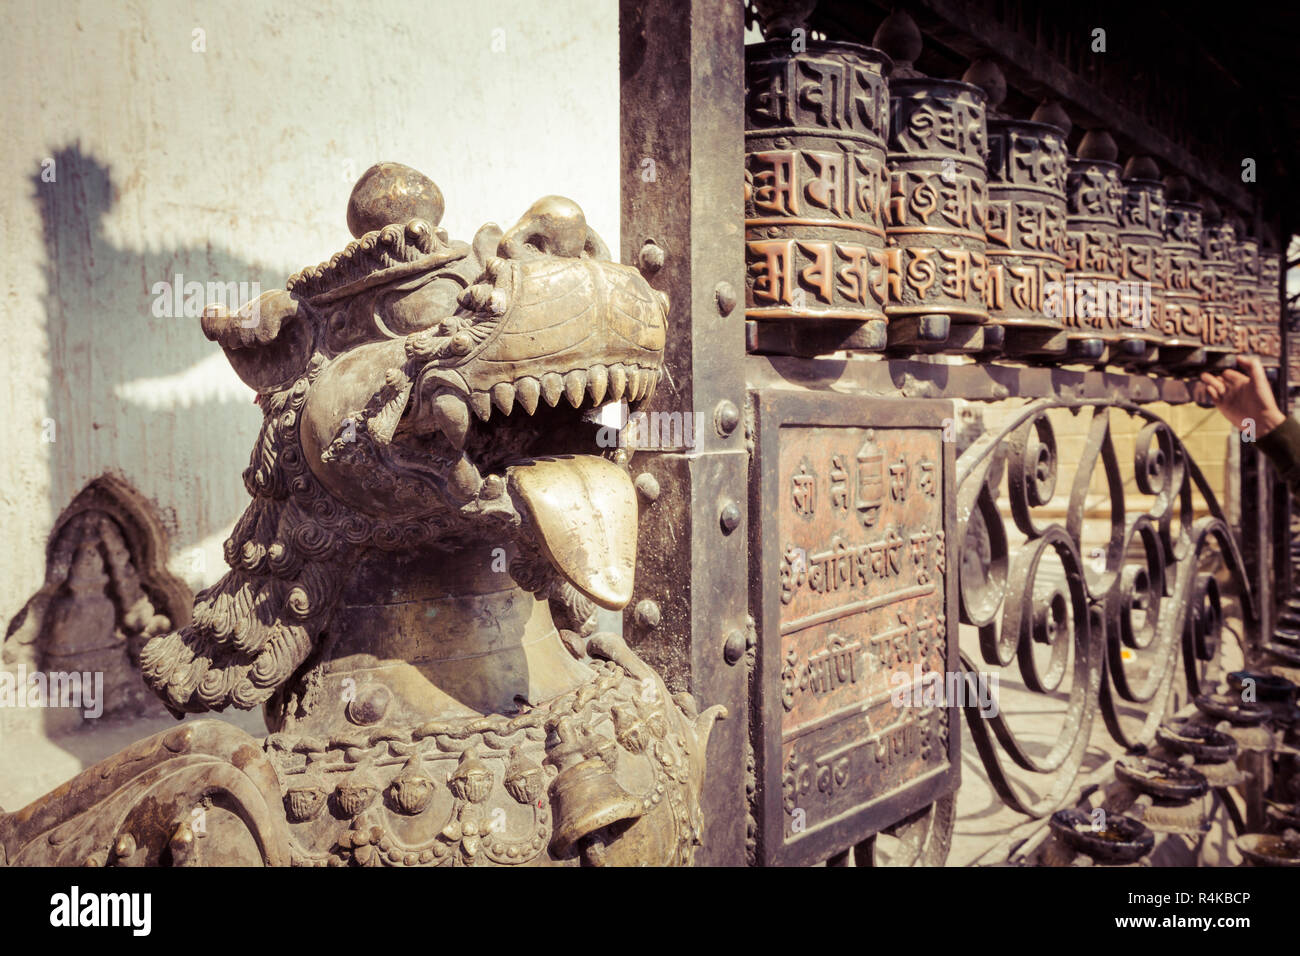 Ancient Tibetan Architecture Symbols Stock Photos & Ancient